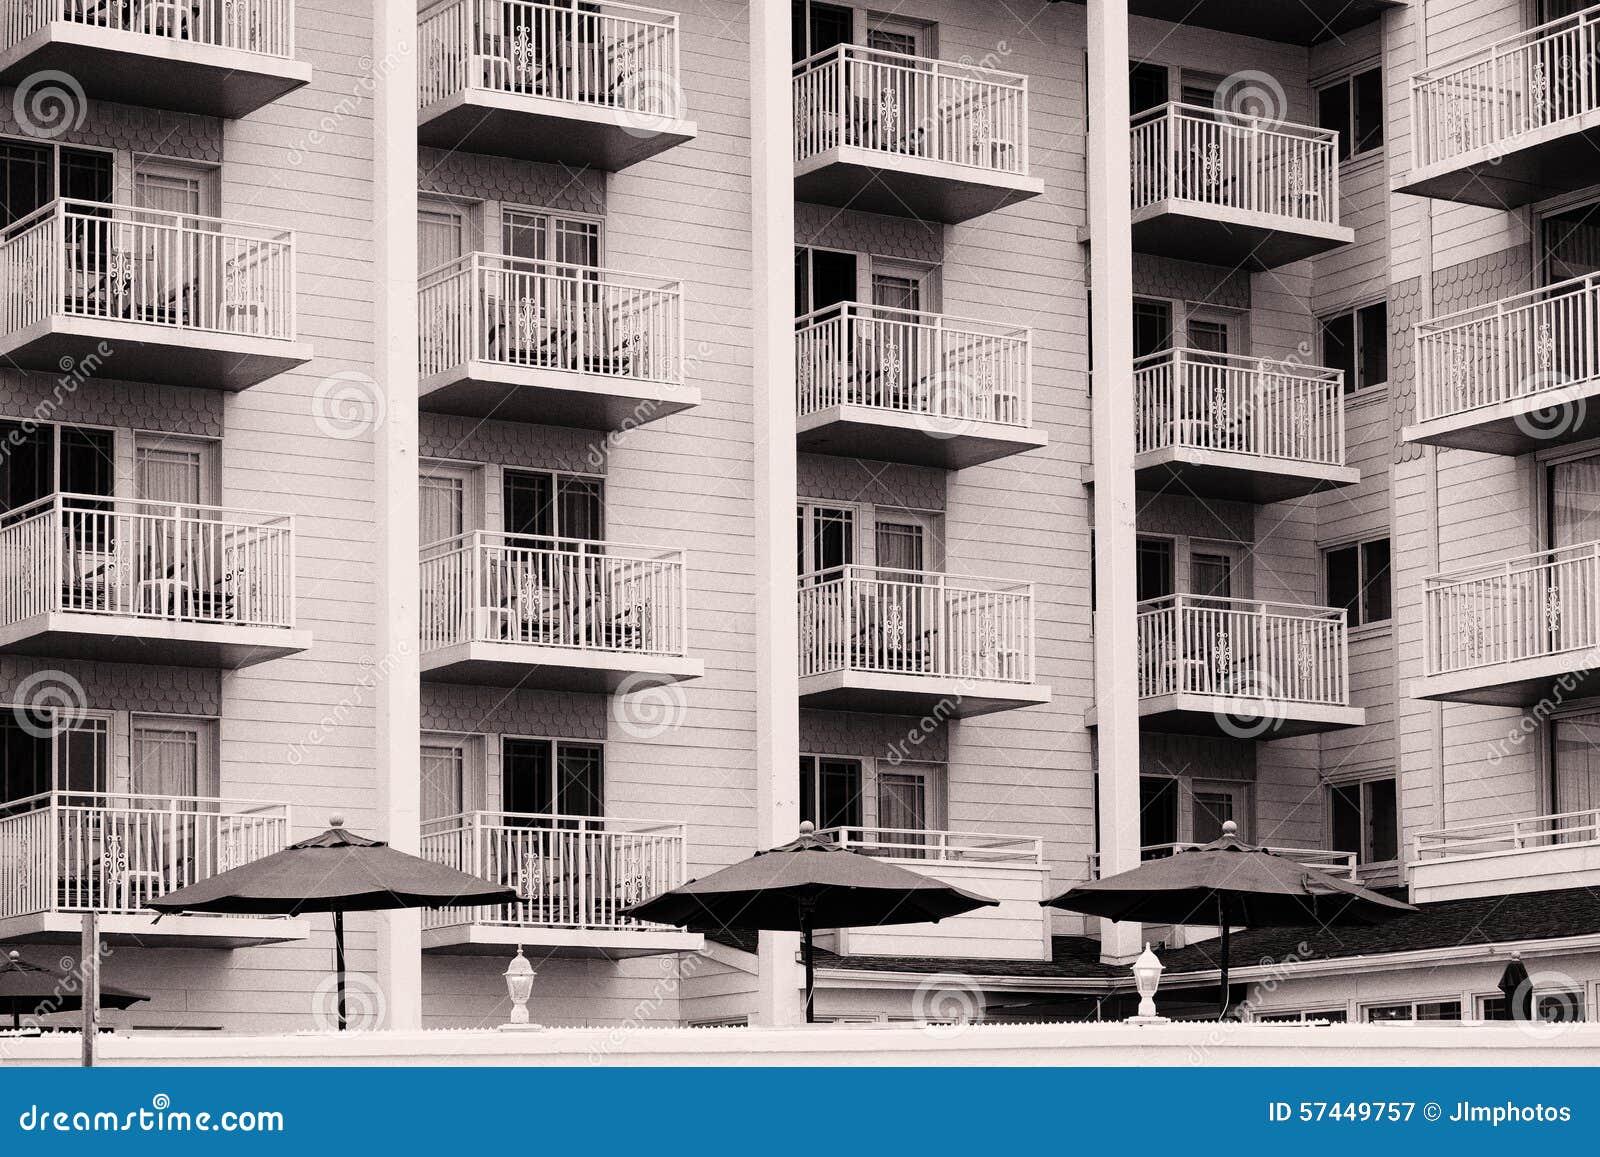 New Jersey Beach House Railings